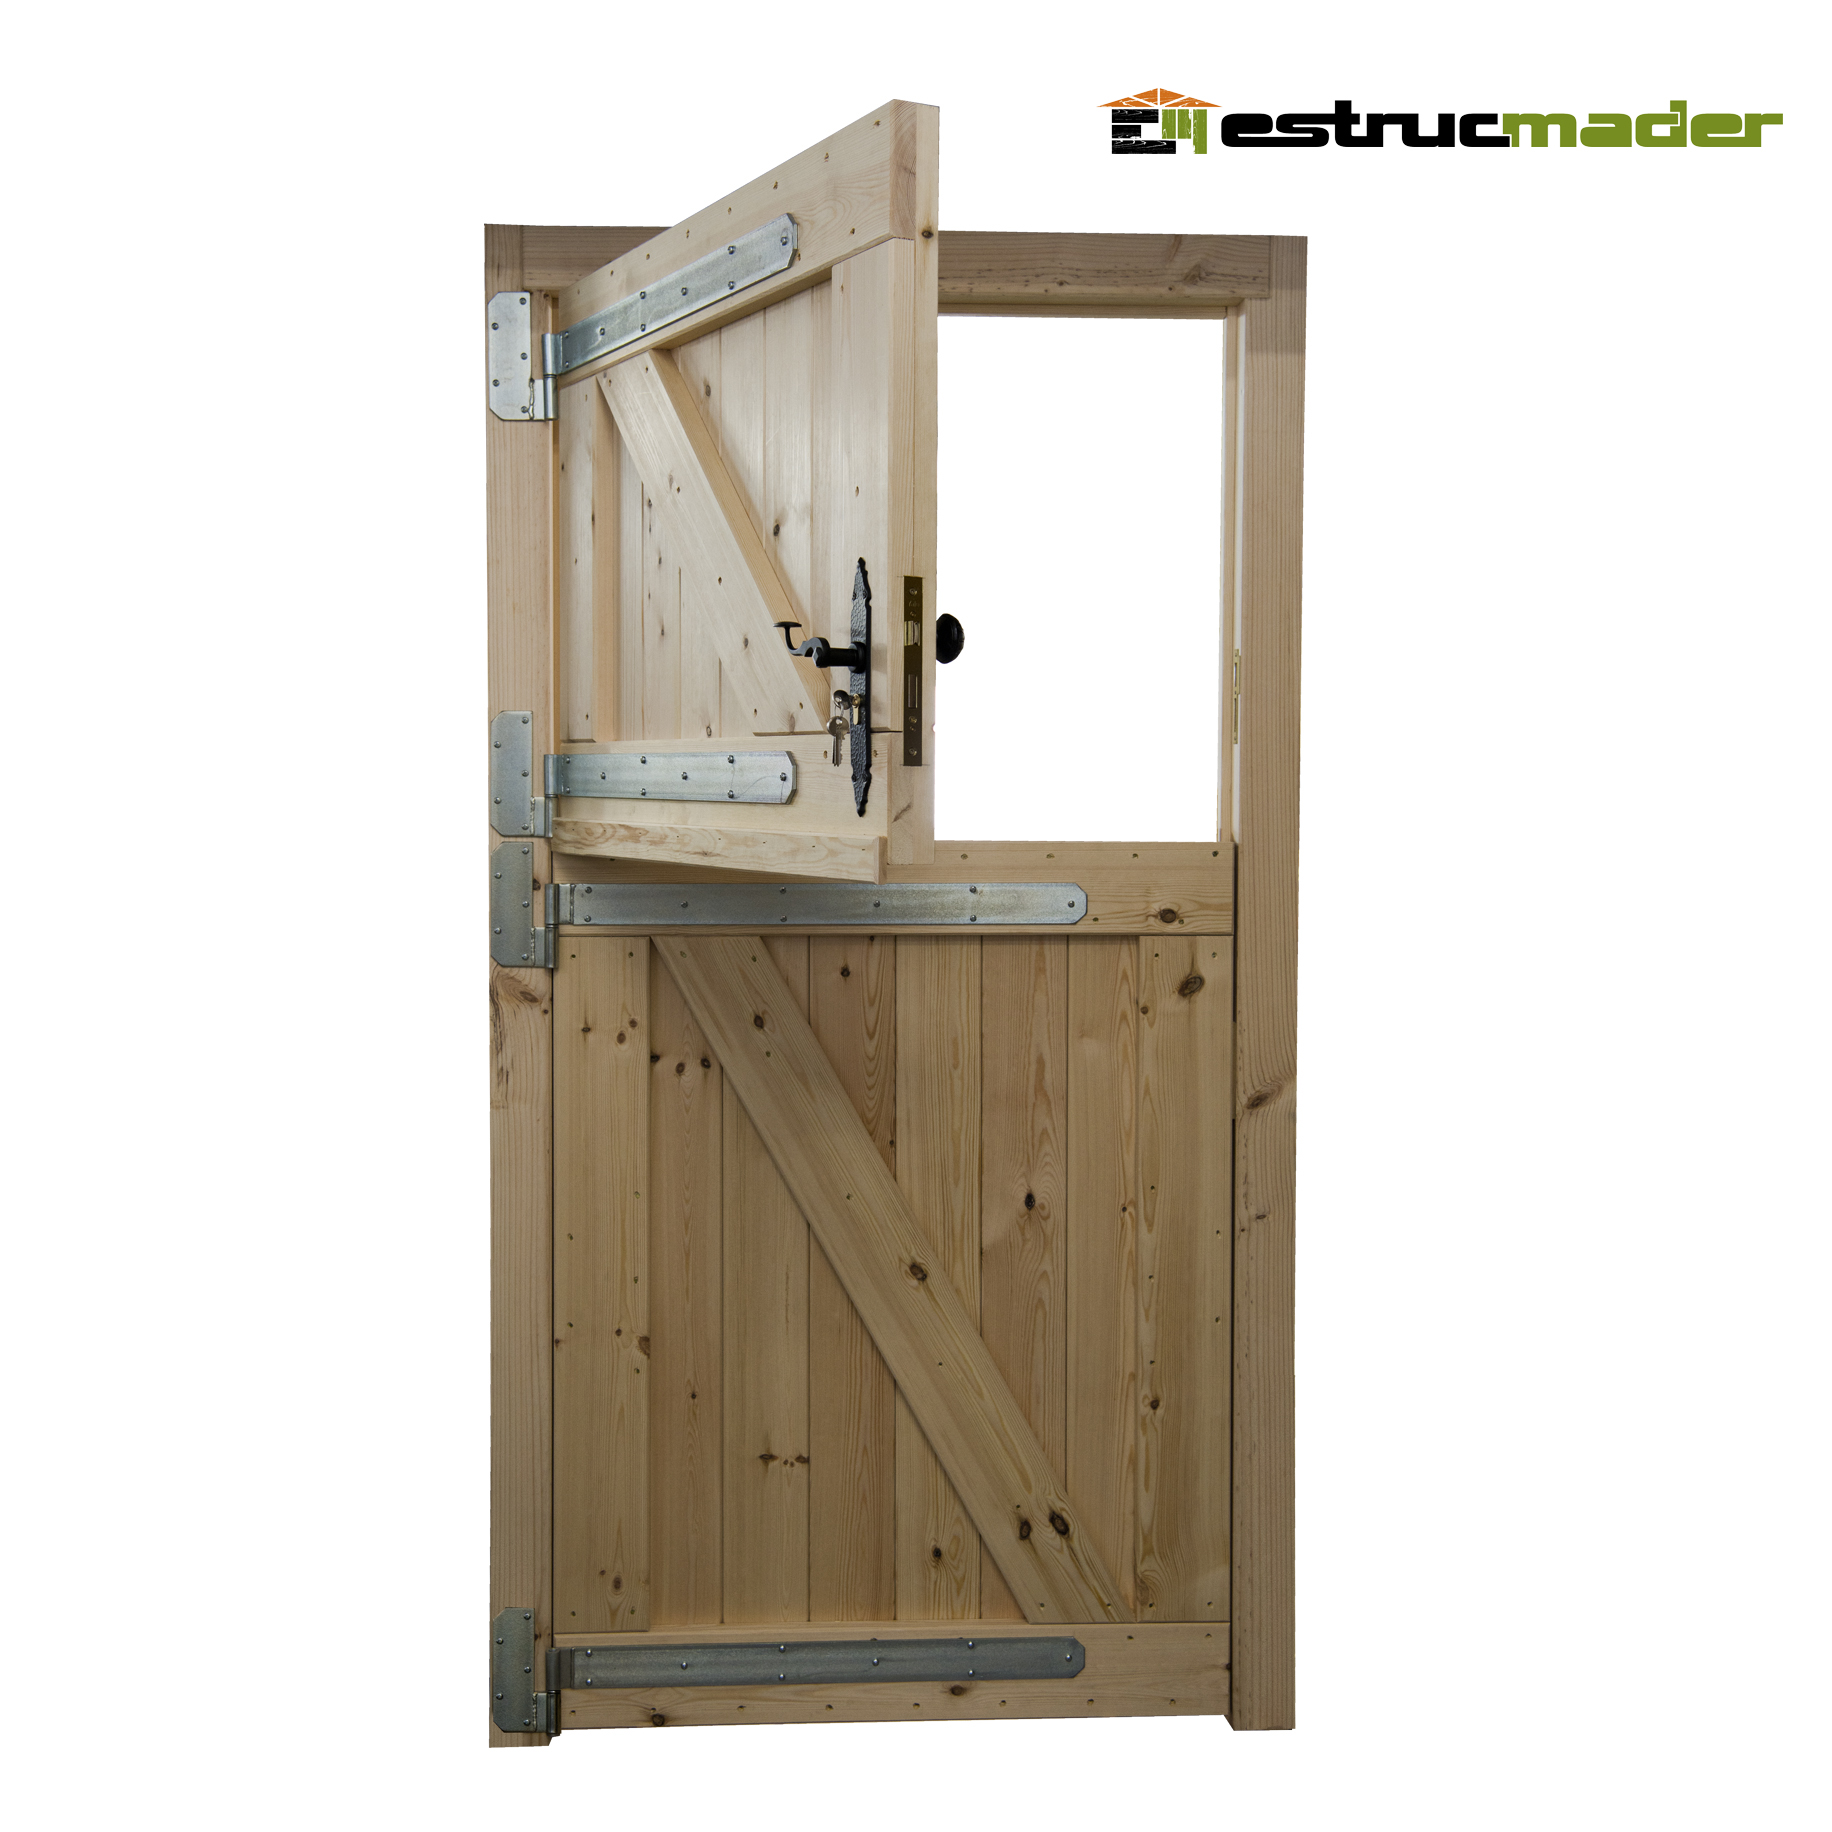 Portón rústico de madera para vivienda Modelo PRE